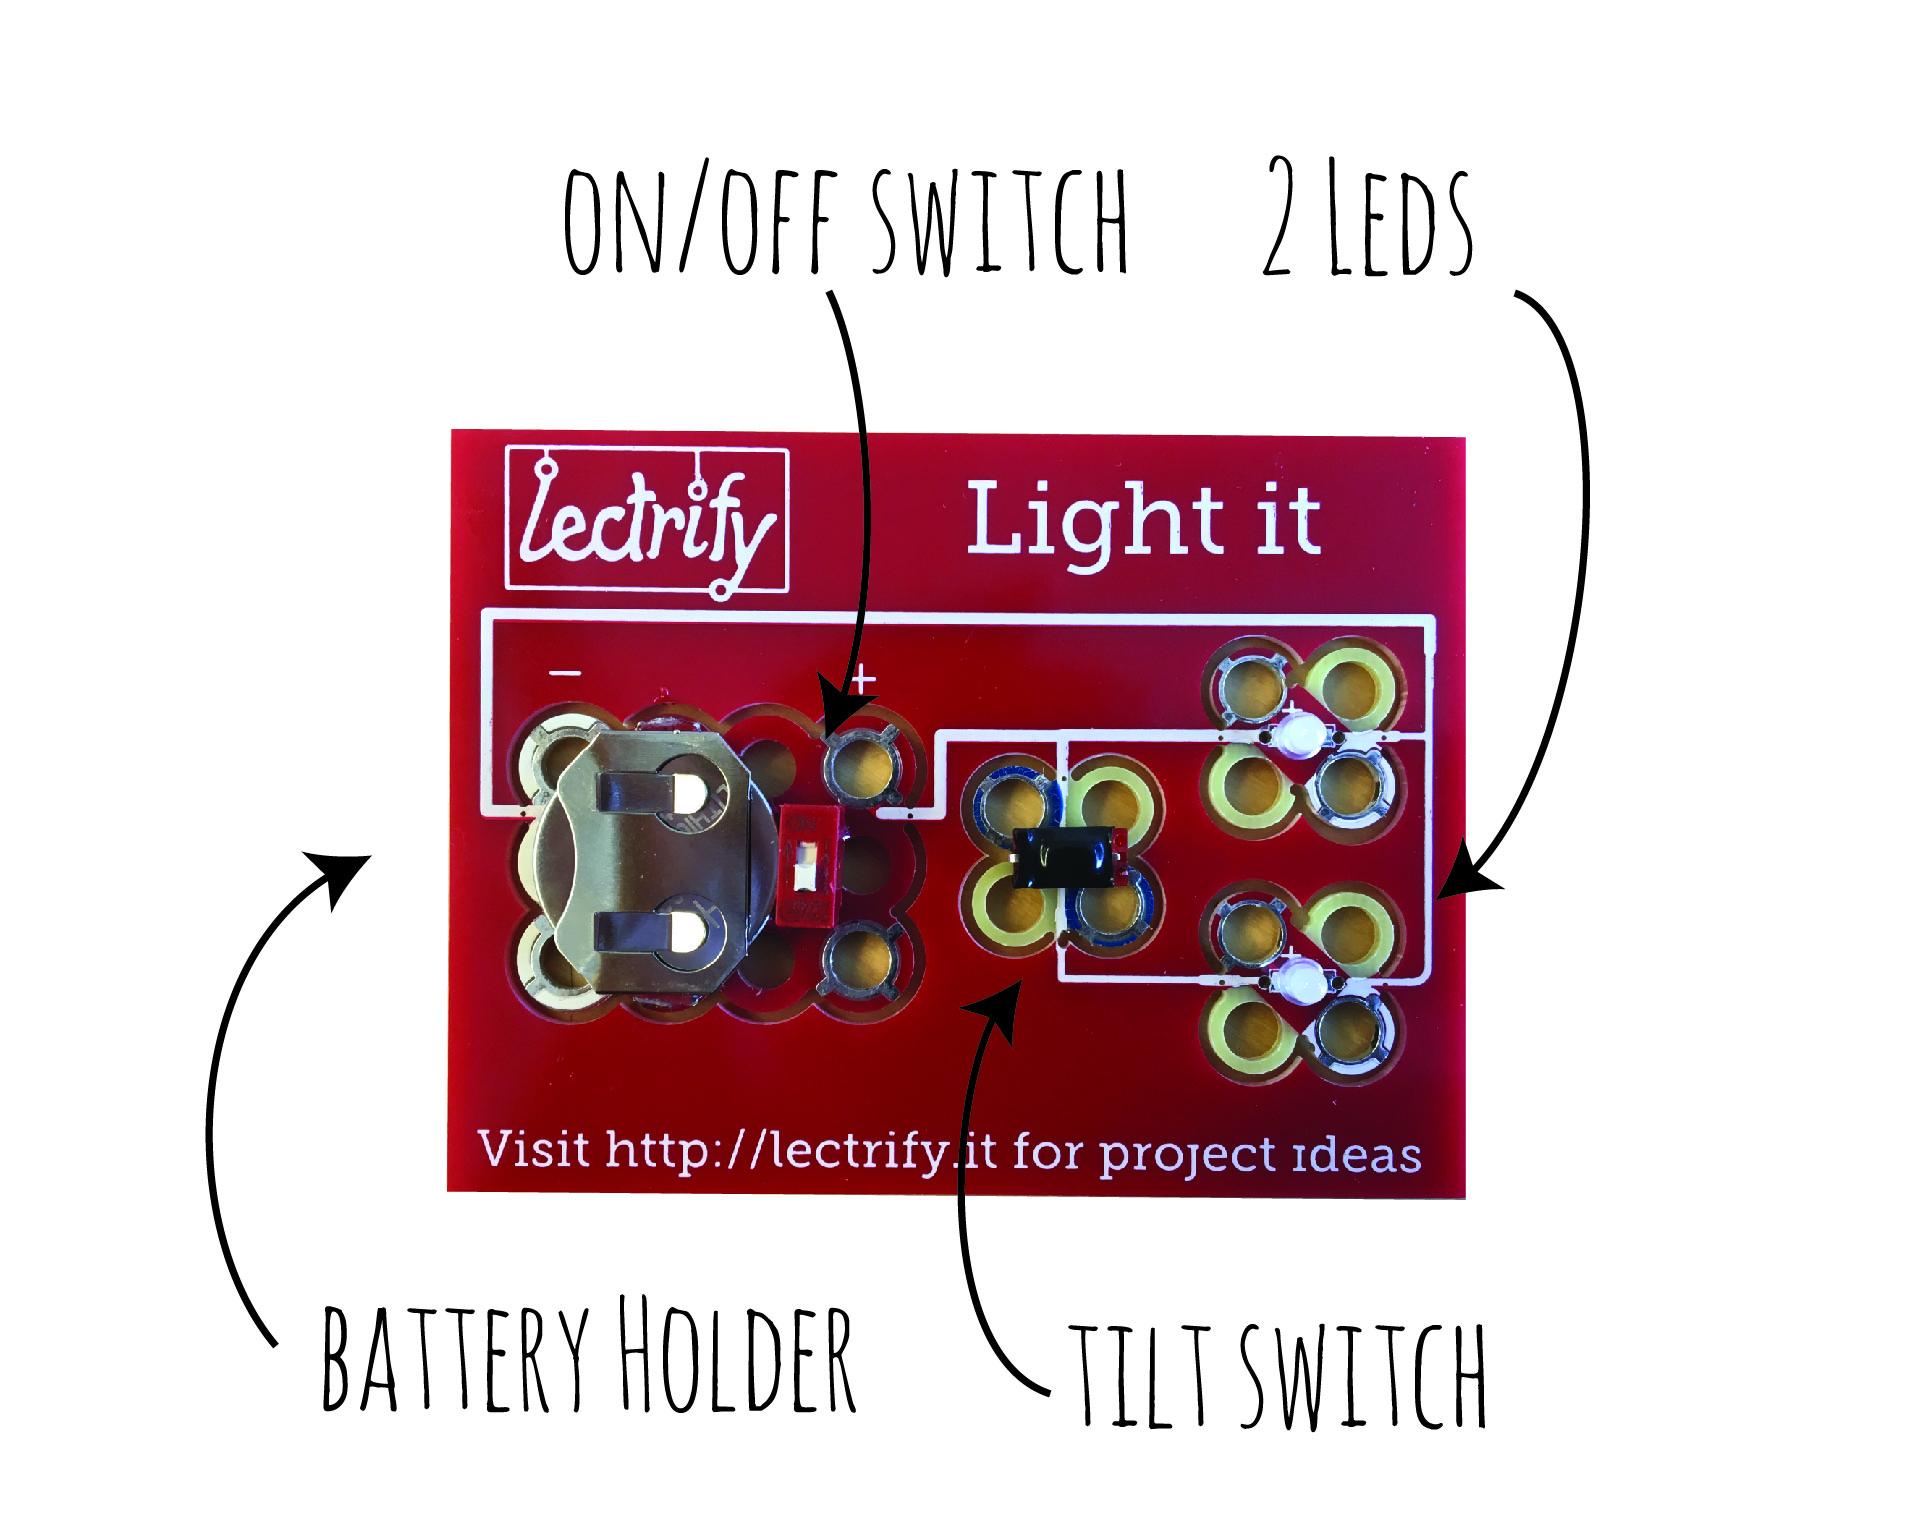 Light it board graphic_Tilt Switch.jpg